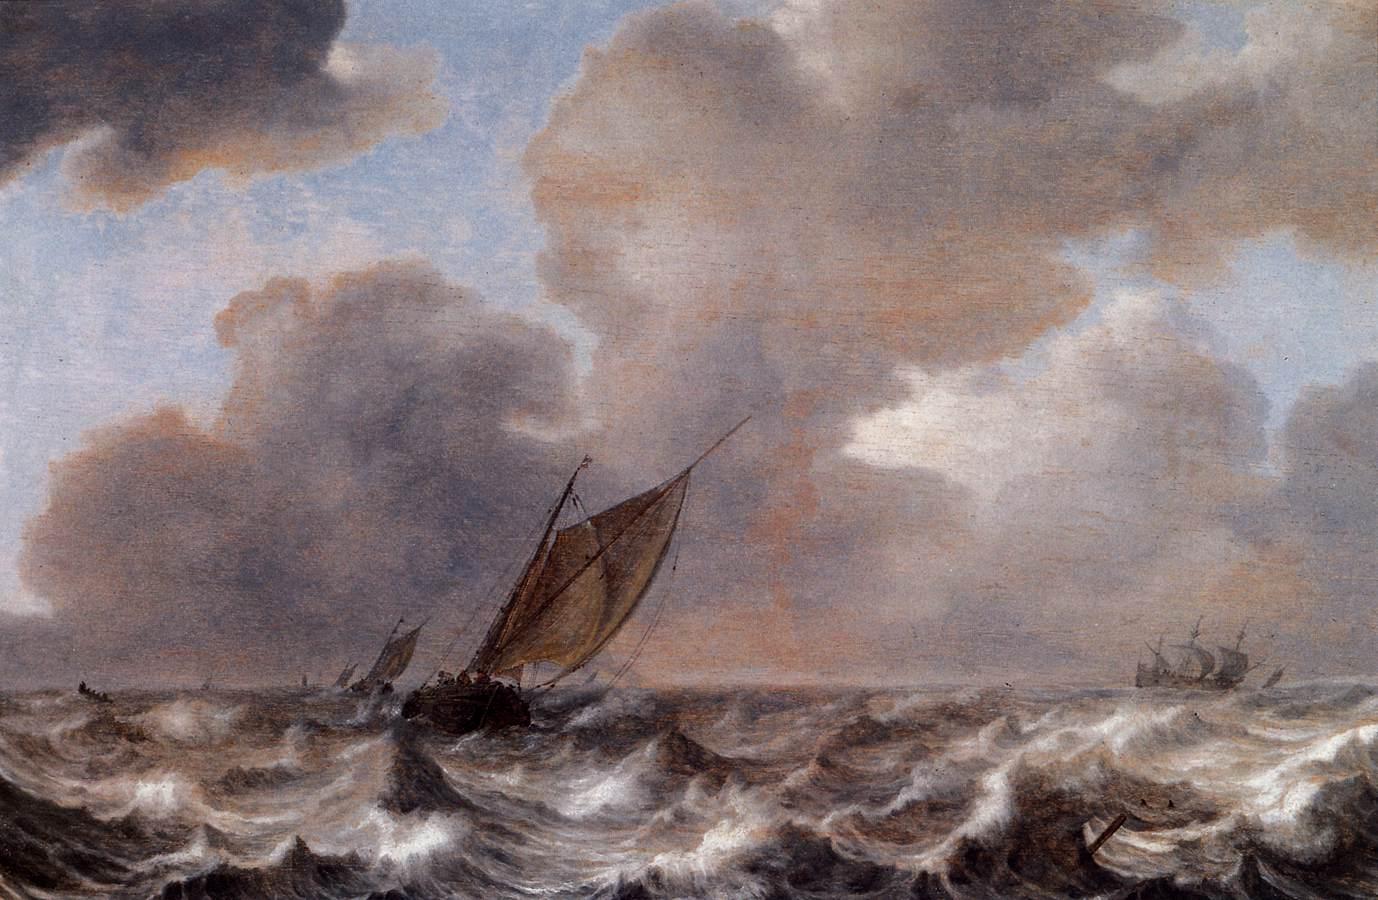 File:Jan Porcellis - Vessels in a Strong Wind - WGA18157 jpg